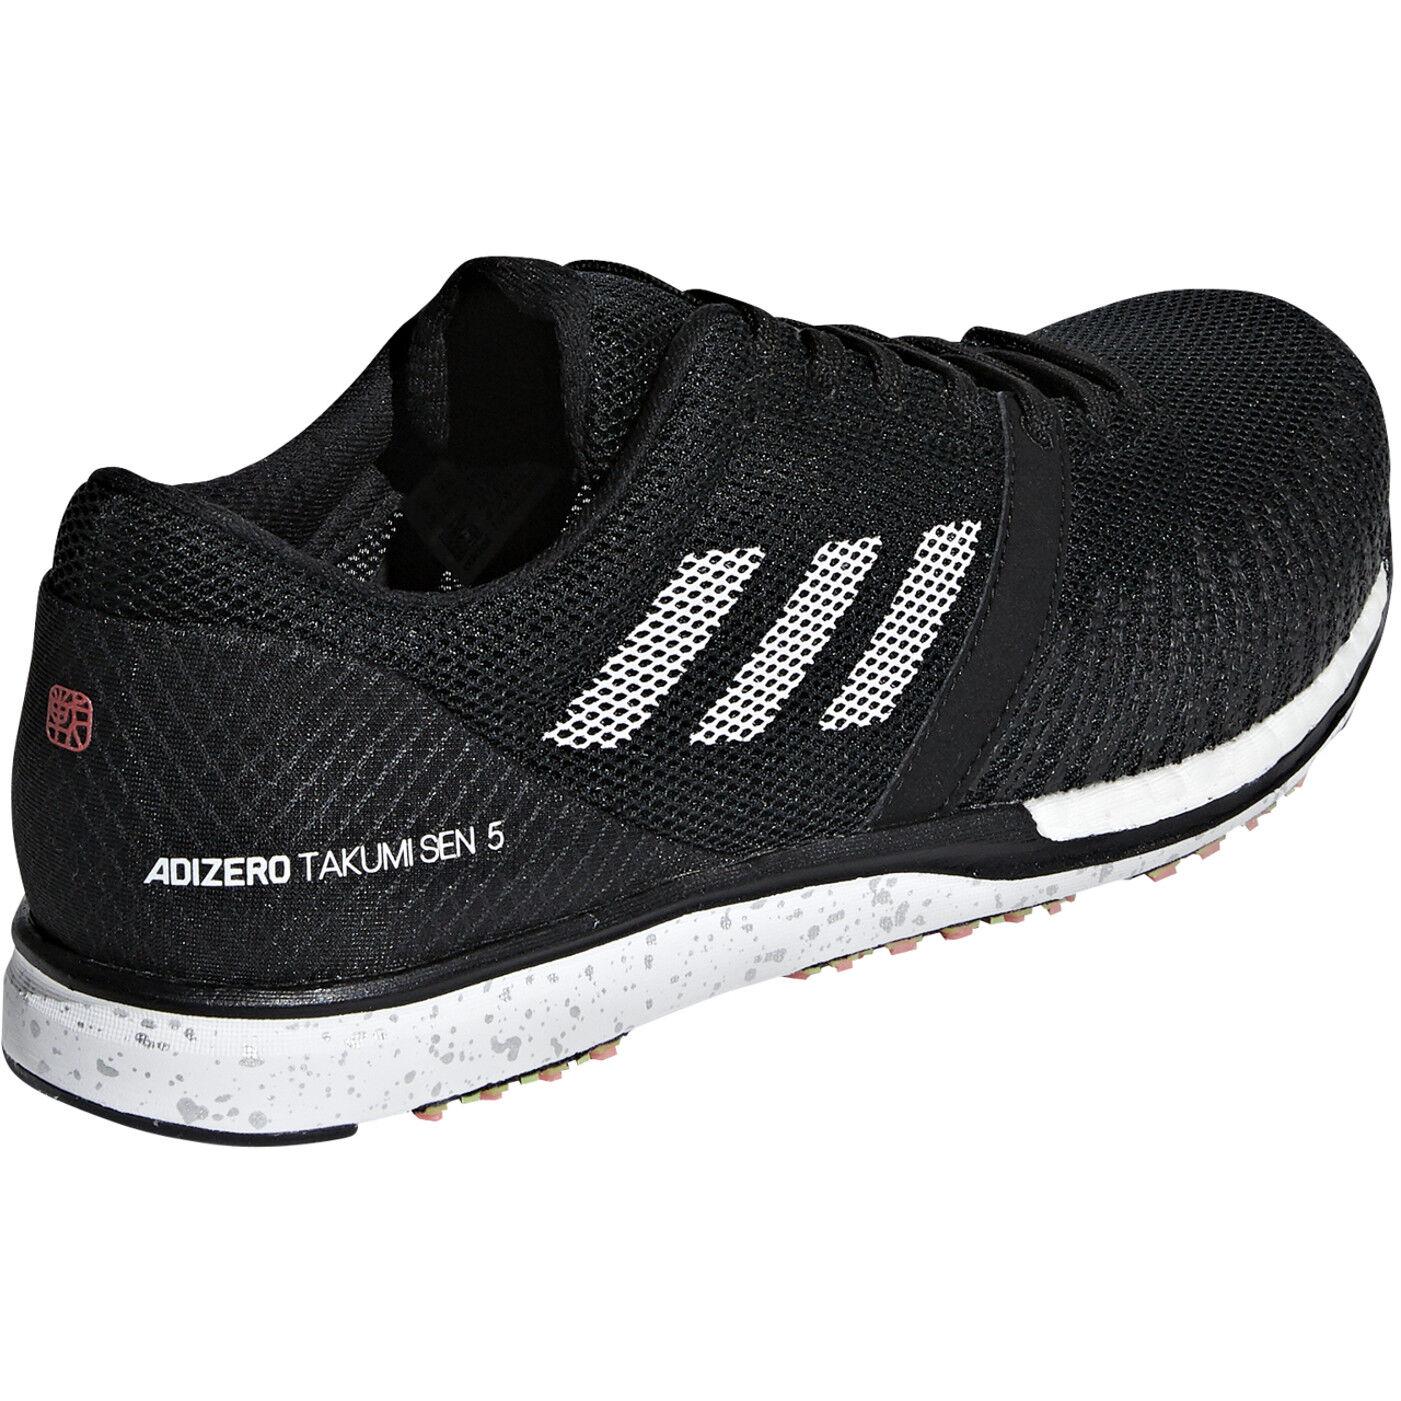 adidas Adizero Takumi Sen 5 Shoes Herren core blackftwr whitecarbon